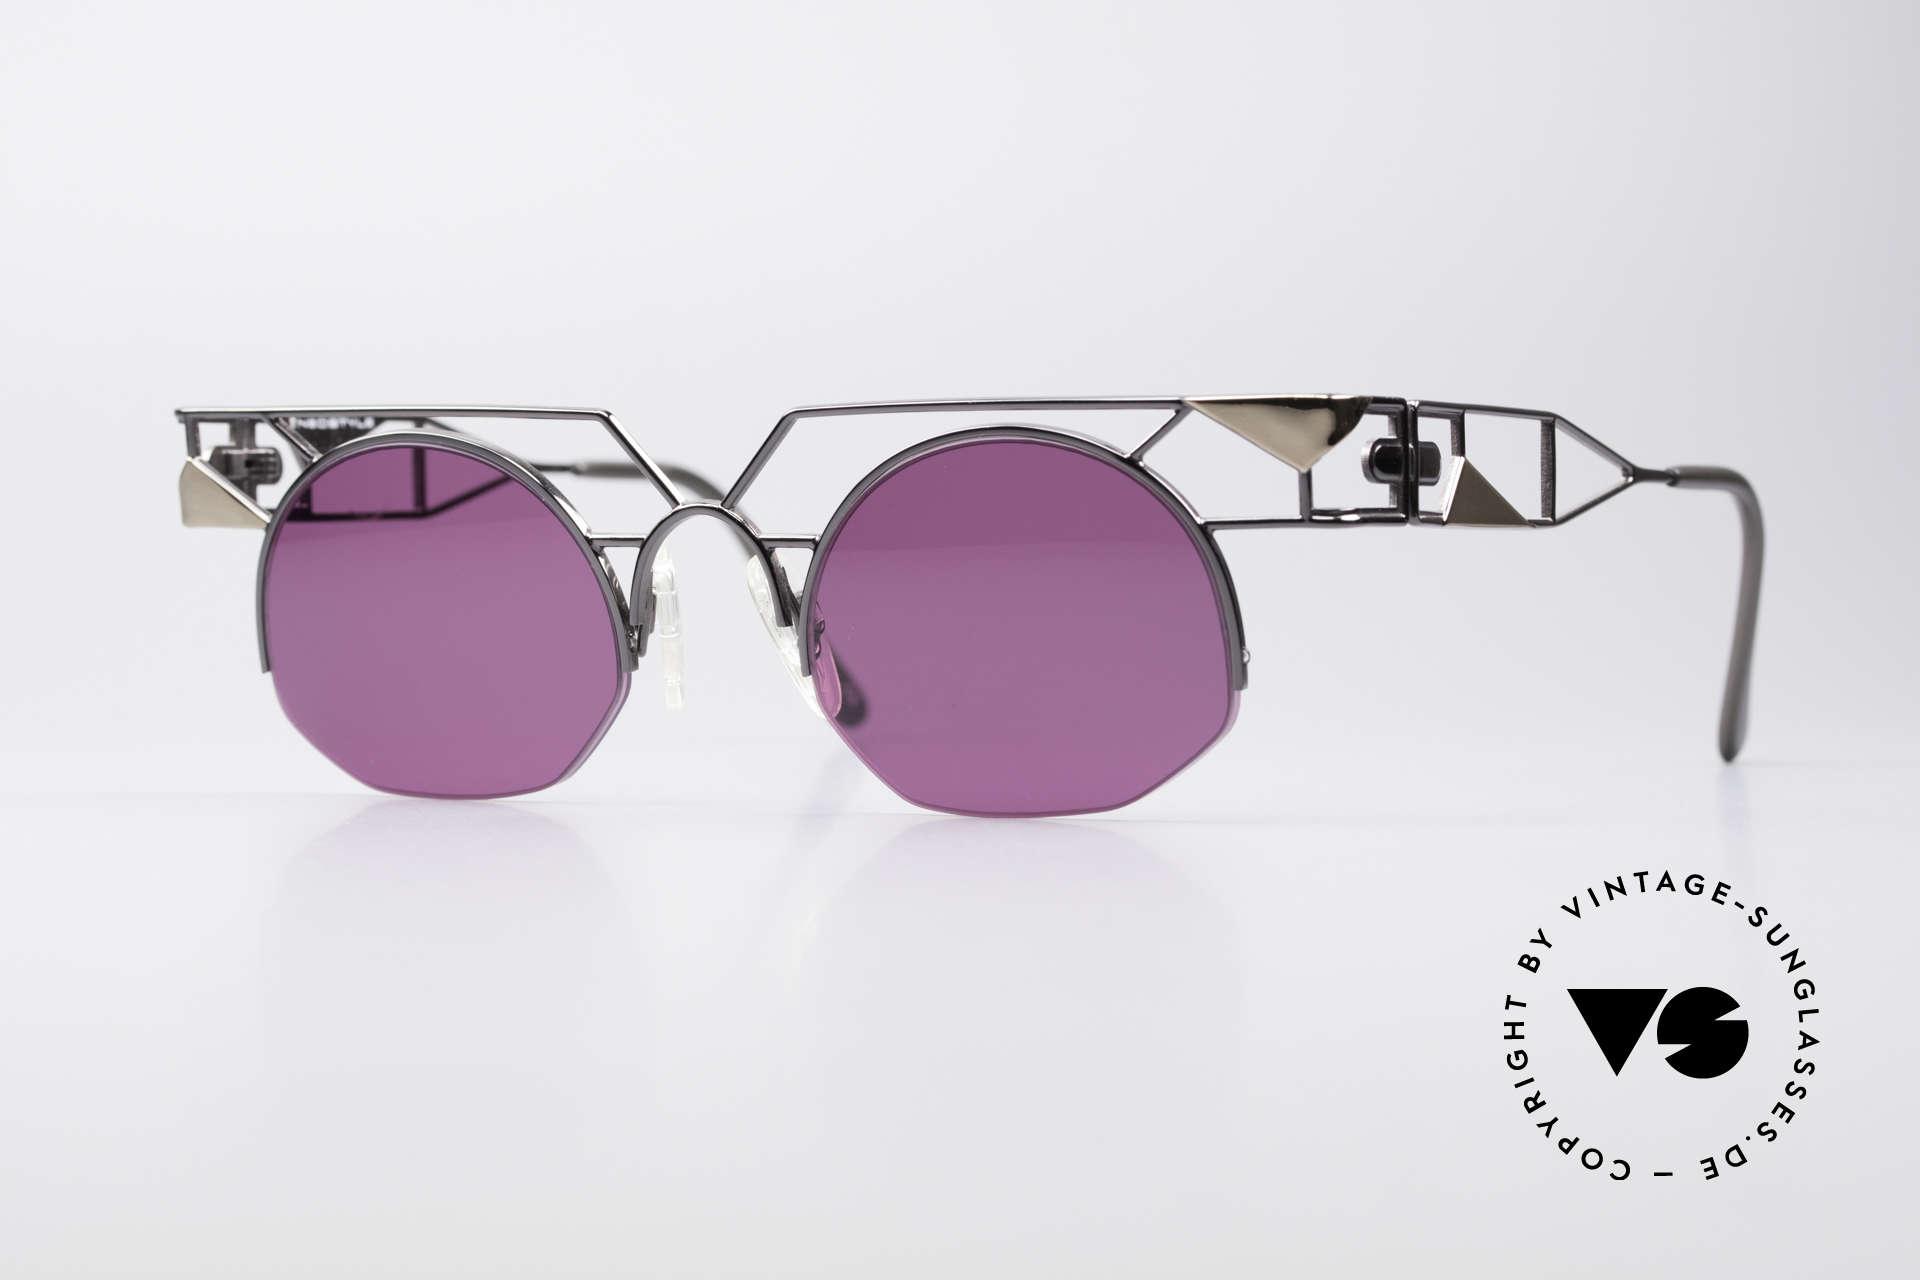 19be264dbb Sunglasses Neostyle Jet 224 Sunglasses Steampunk Style